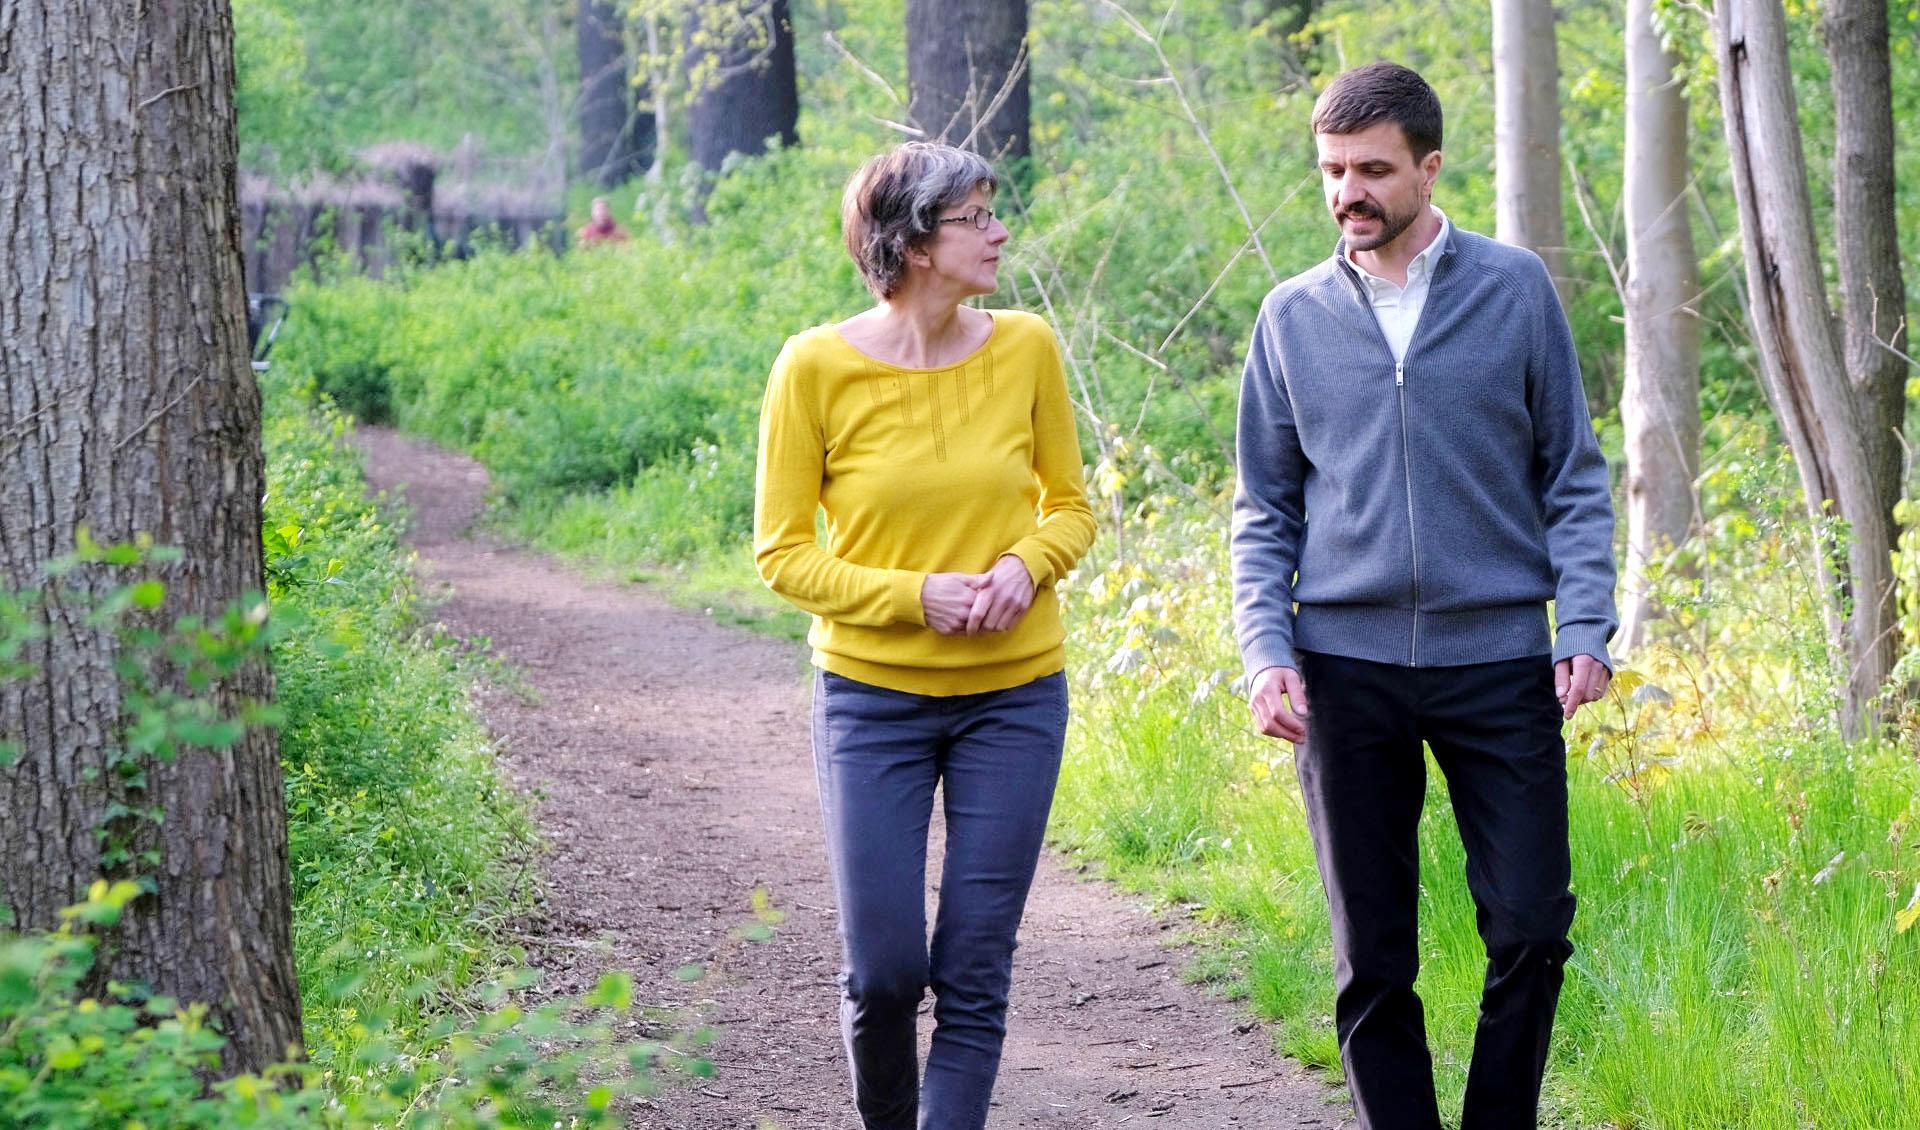 Claudia Seidel Business Coach, Leadership Coach - Walk and Talk Coaching, Coaching in der Natur in Berlin Treptower Park und Plänterwald